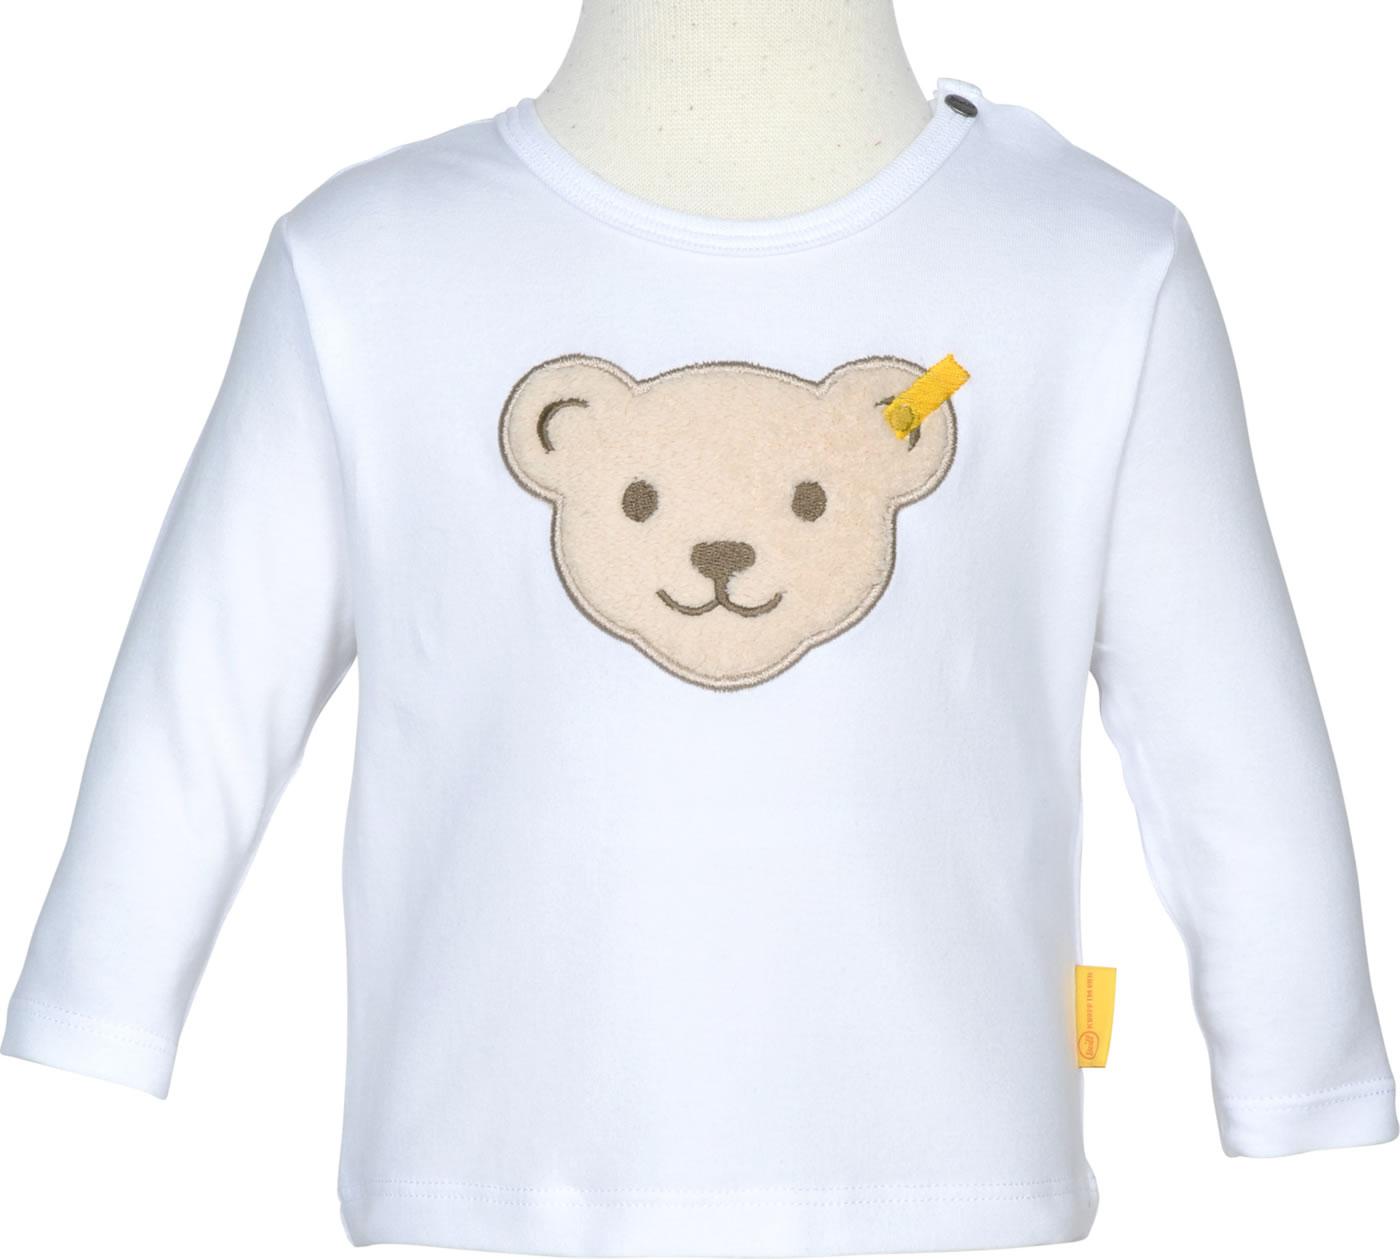 Steiff Unisex Baby Sweatshirt